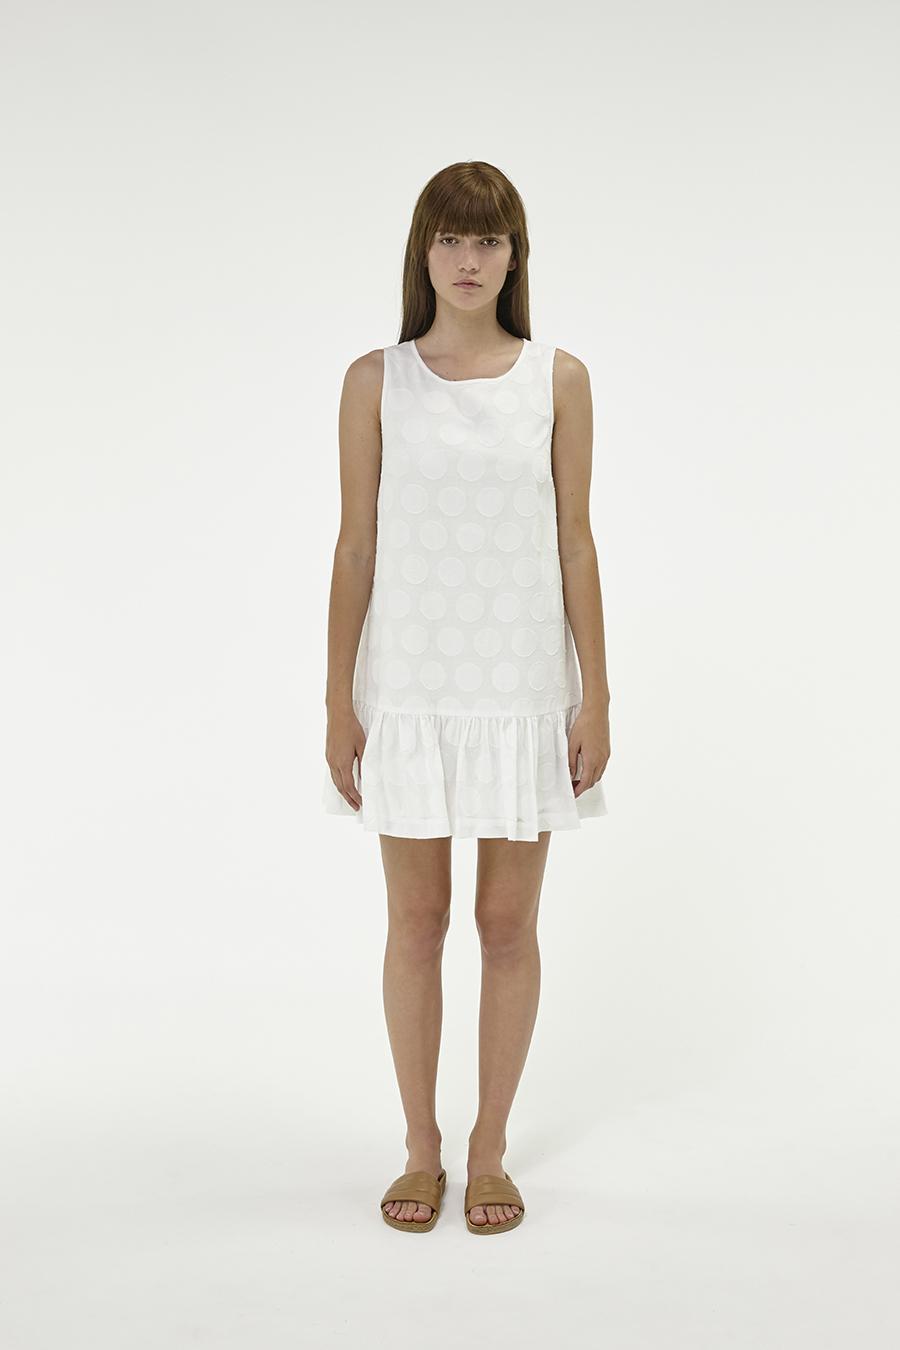 Huffer_Q3-16_W-Spot-Port-Dress_White-01